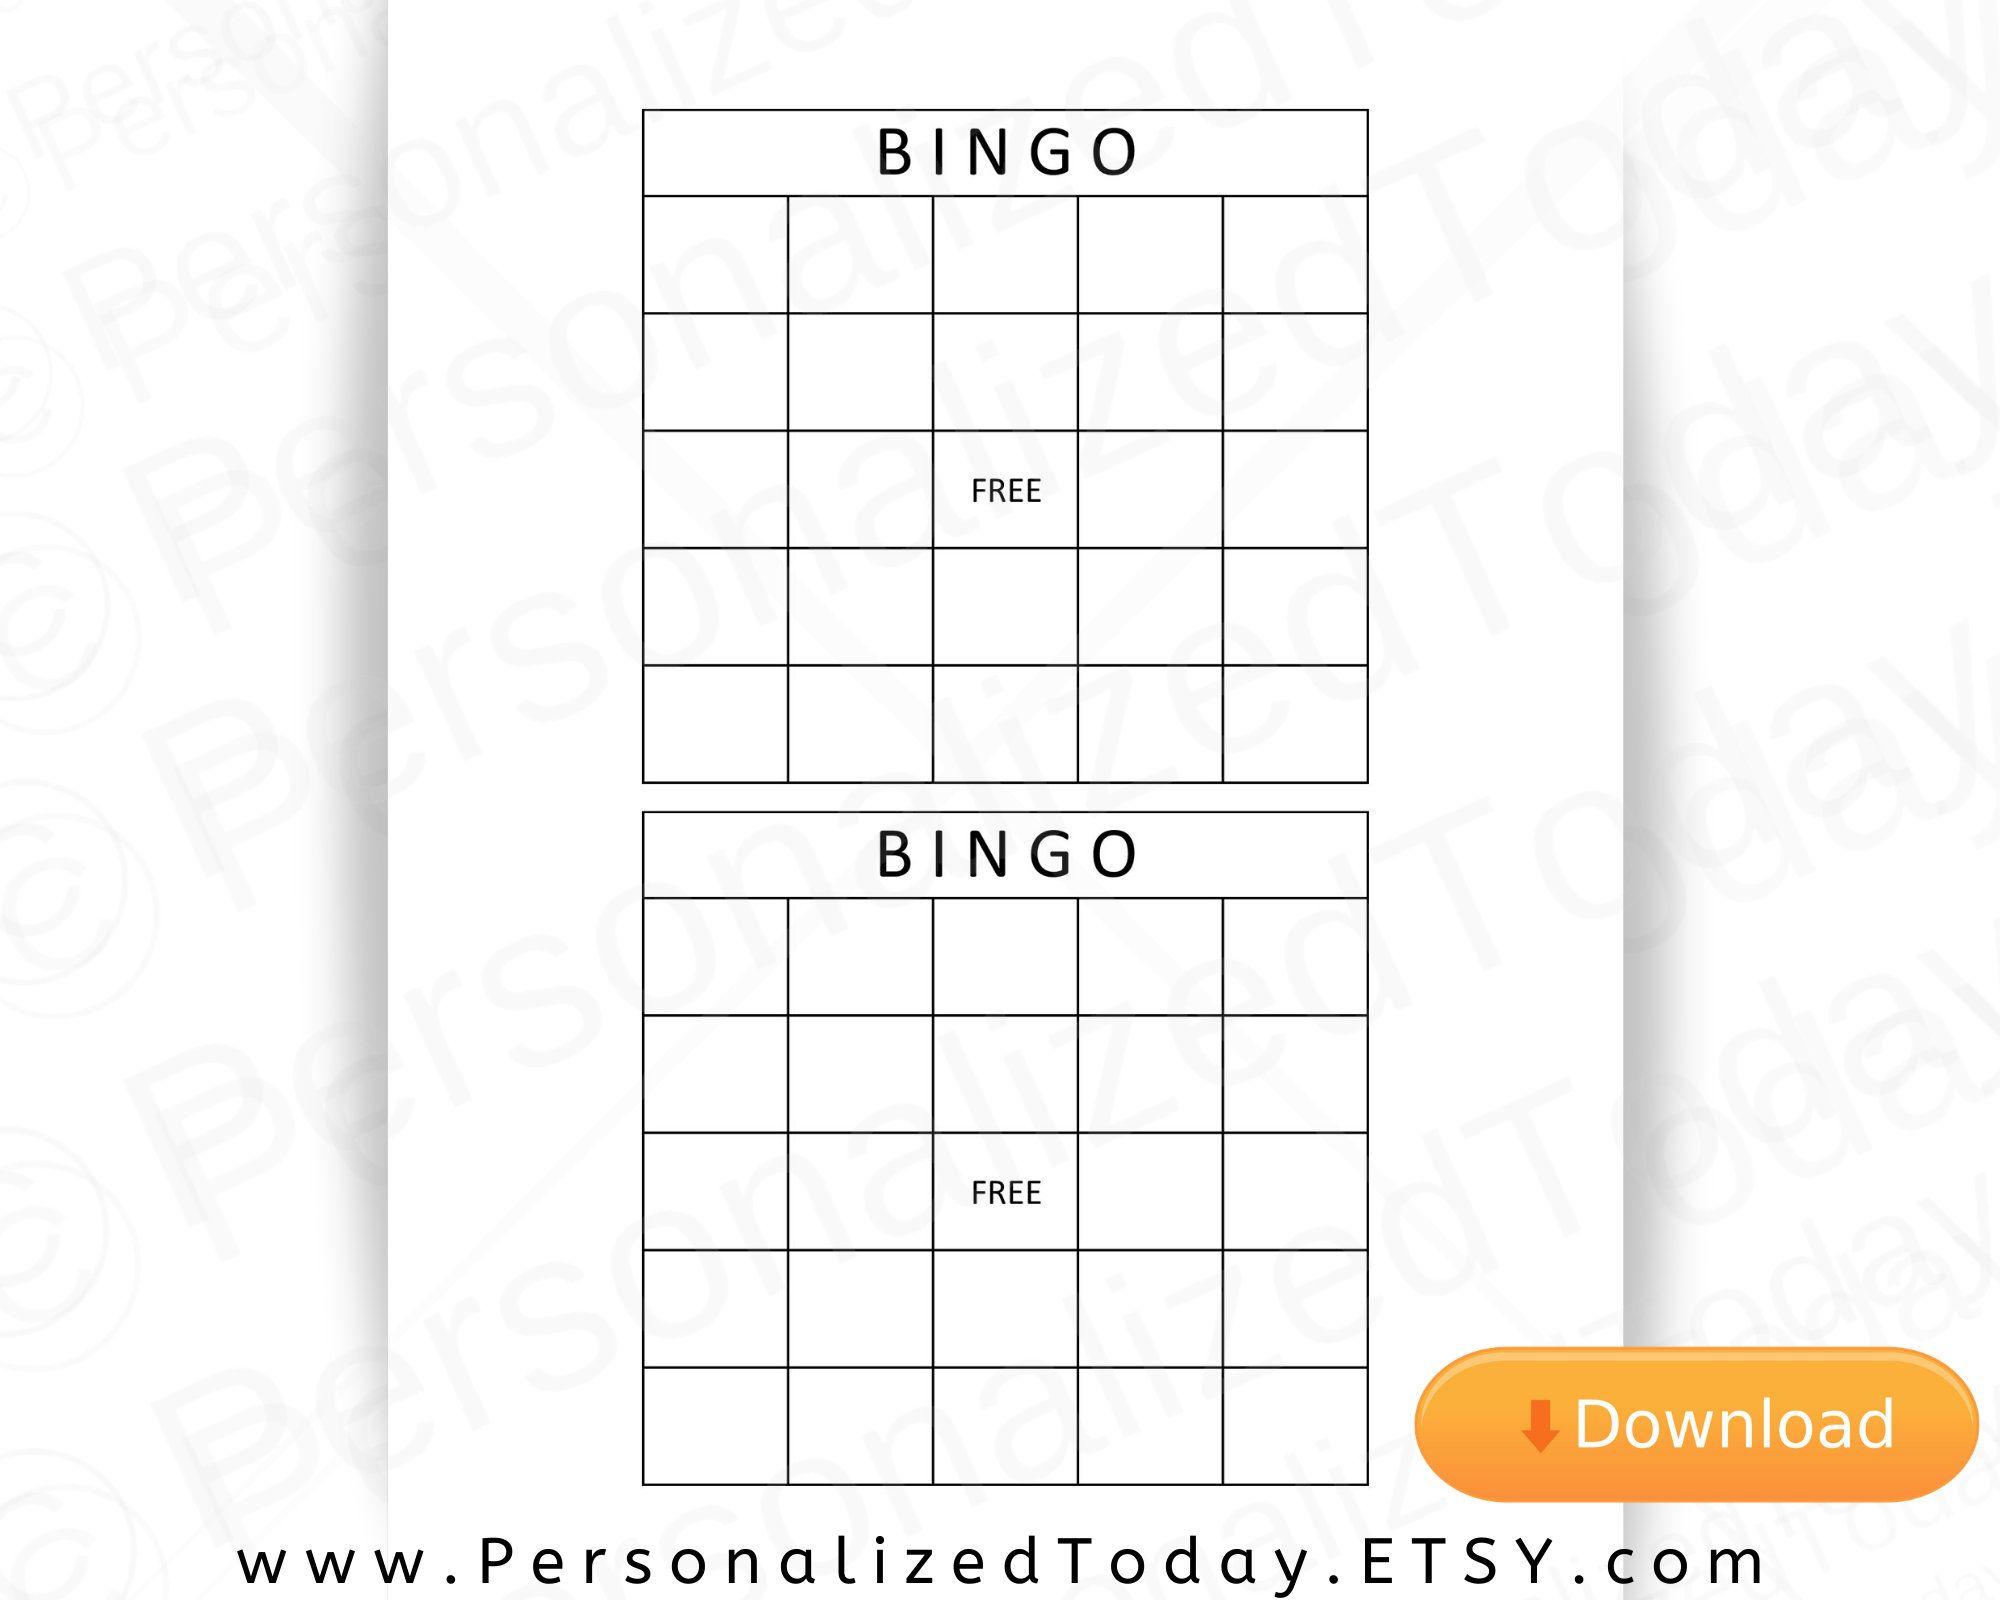 Blank Printable Bingo Board Calling Cards Download For Make Etsy In 2021 Blank Bingo Cards Bingo Cards Printable Templates Bingo Card Template